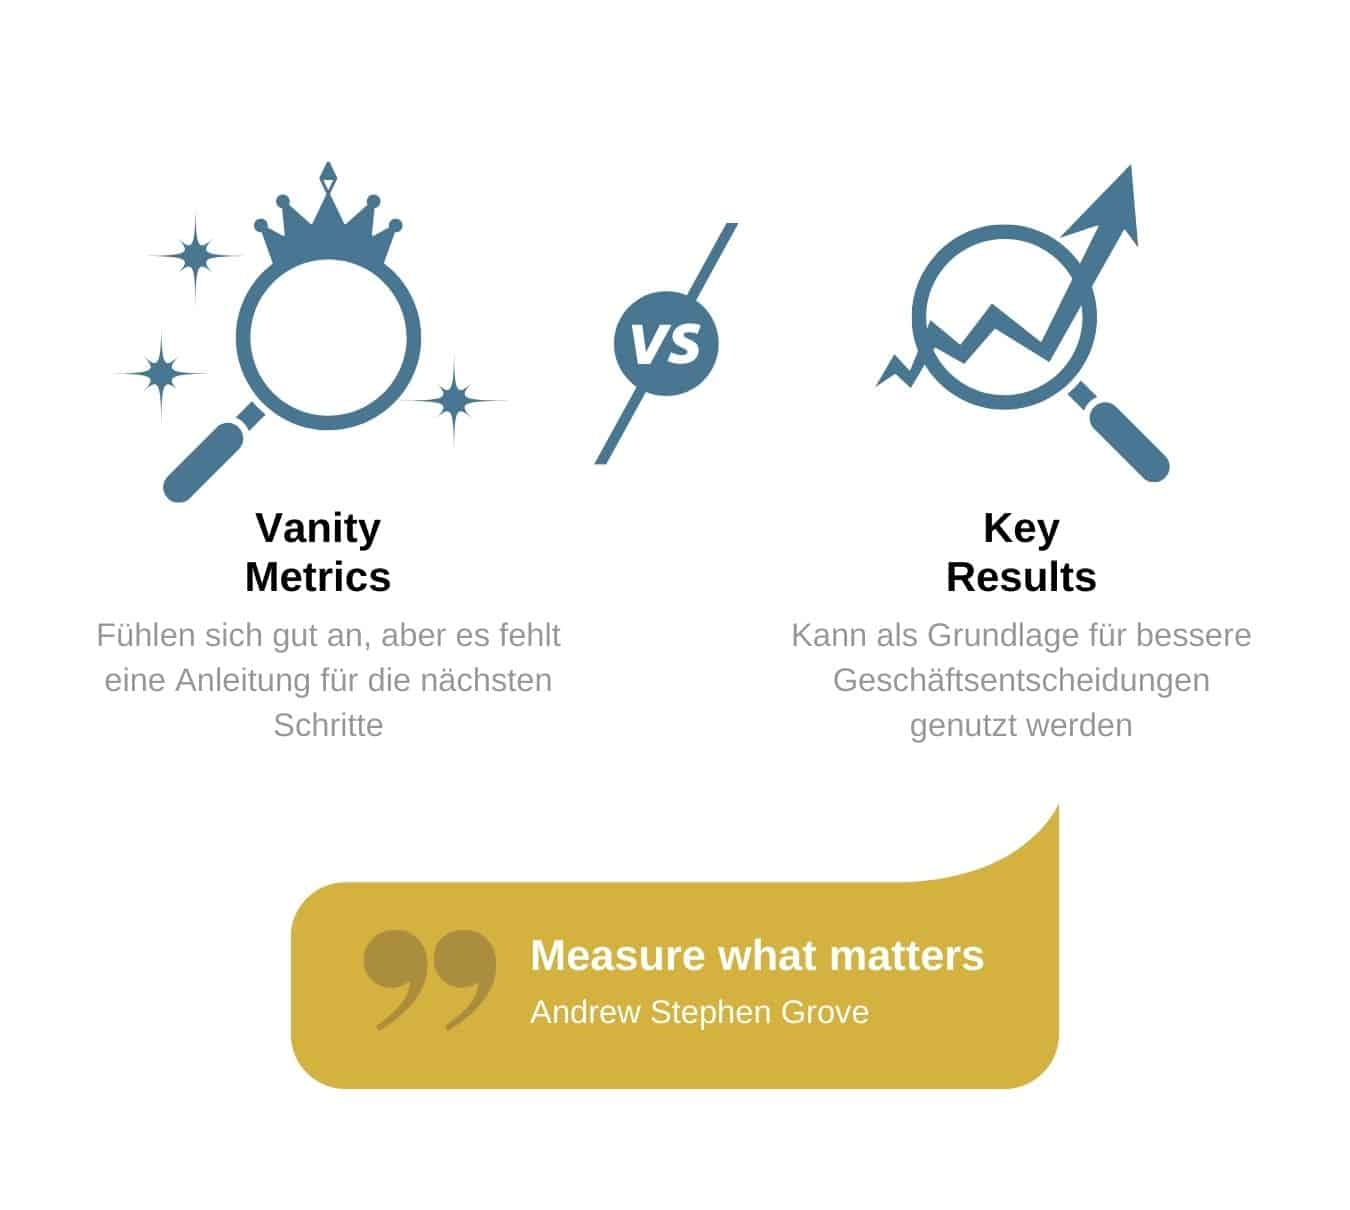 key results vs vanity metrics